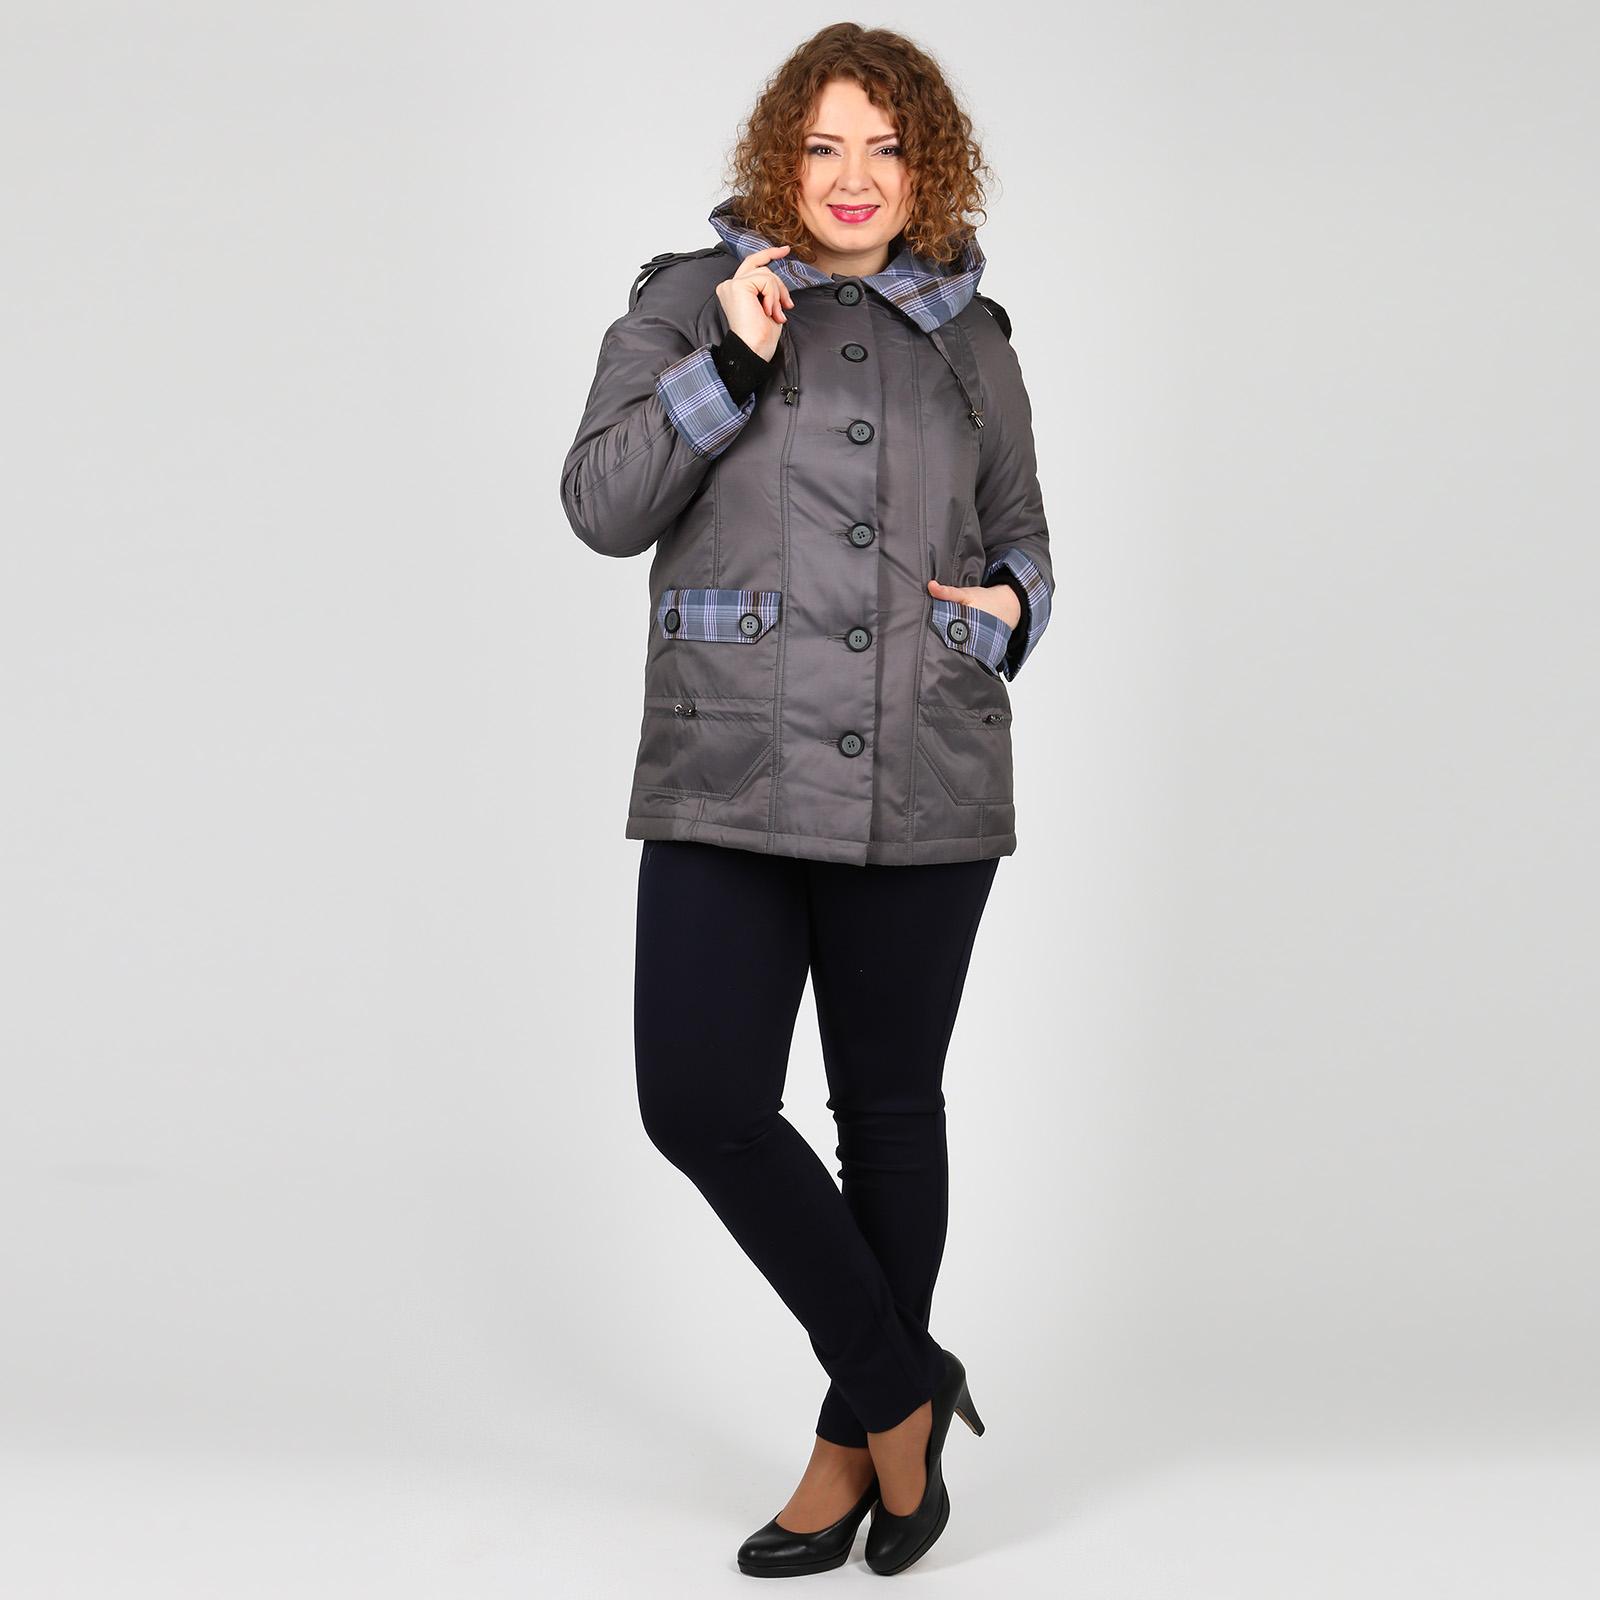 Куртка на пуговицах с карманами